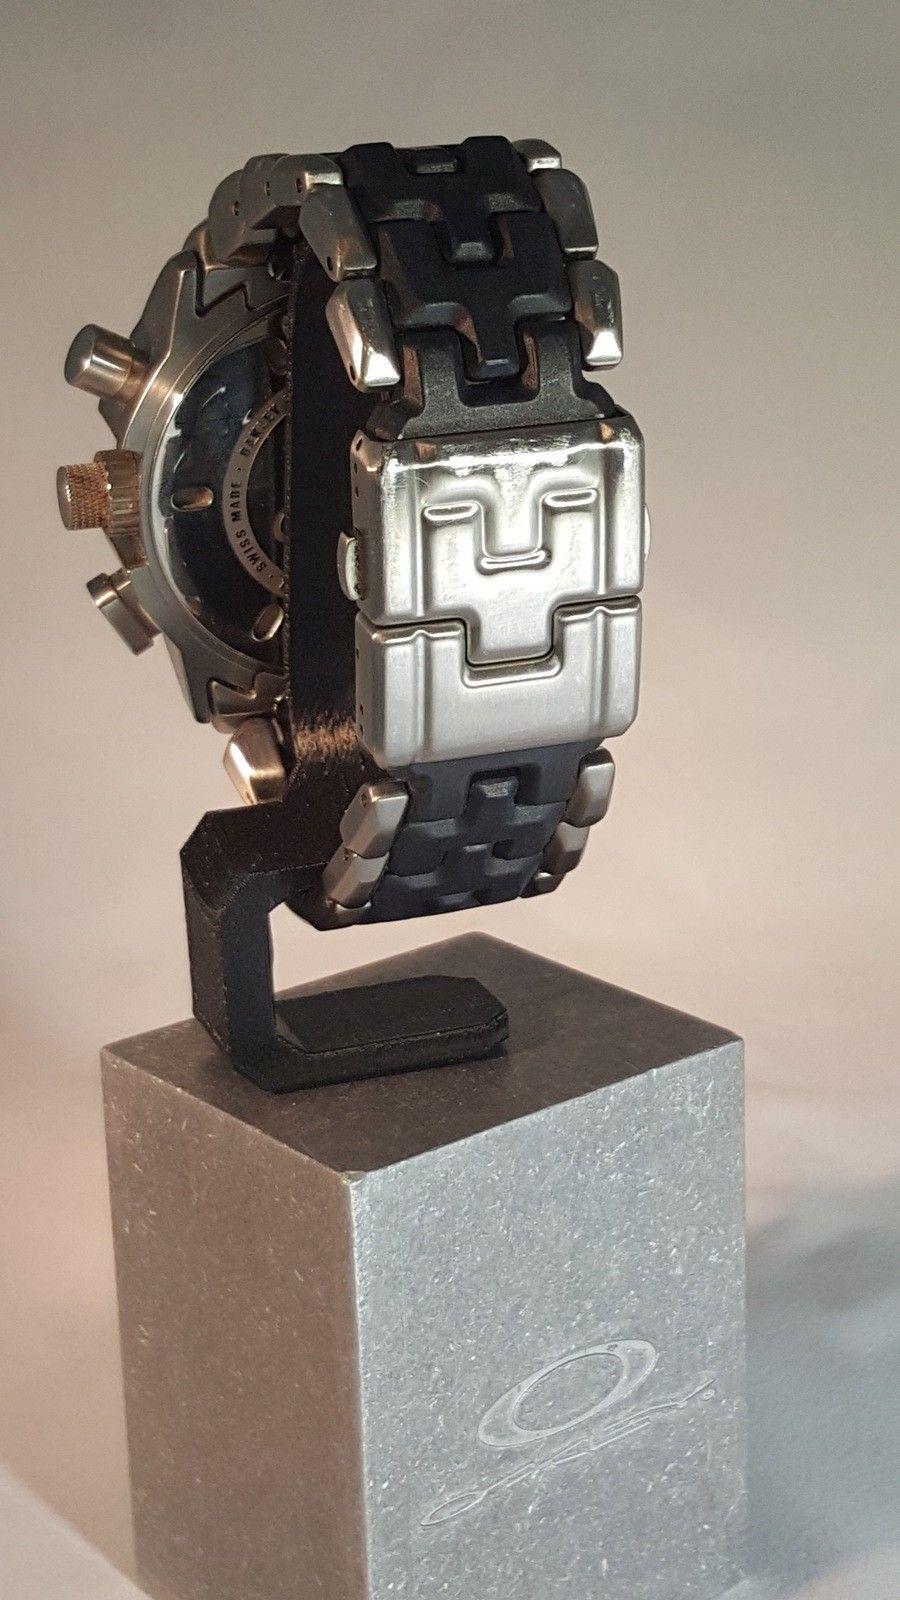 Great Damn Condition - 12 Guage Watch - 500. + Watch Valut - 20151203_132852.jpg.jpeg